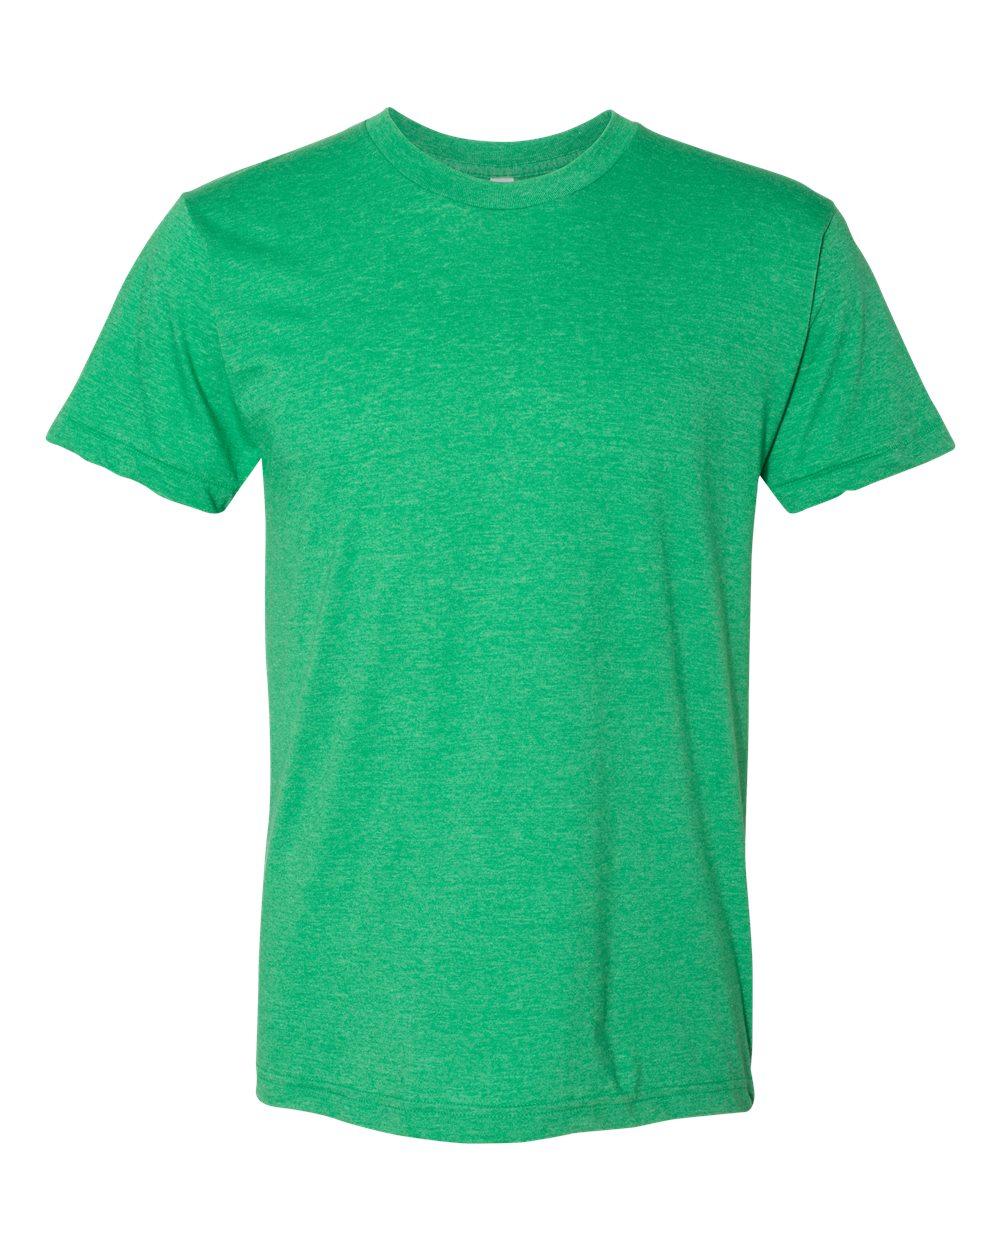 American-Apparel-Mens-Slim-Fit-50-50-Cotton-T-Shirt-Tee-BB401W-up-to-2XL thumbnail 24